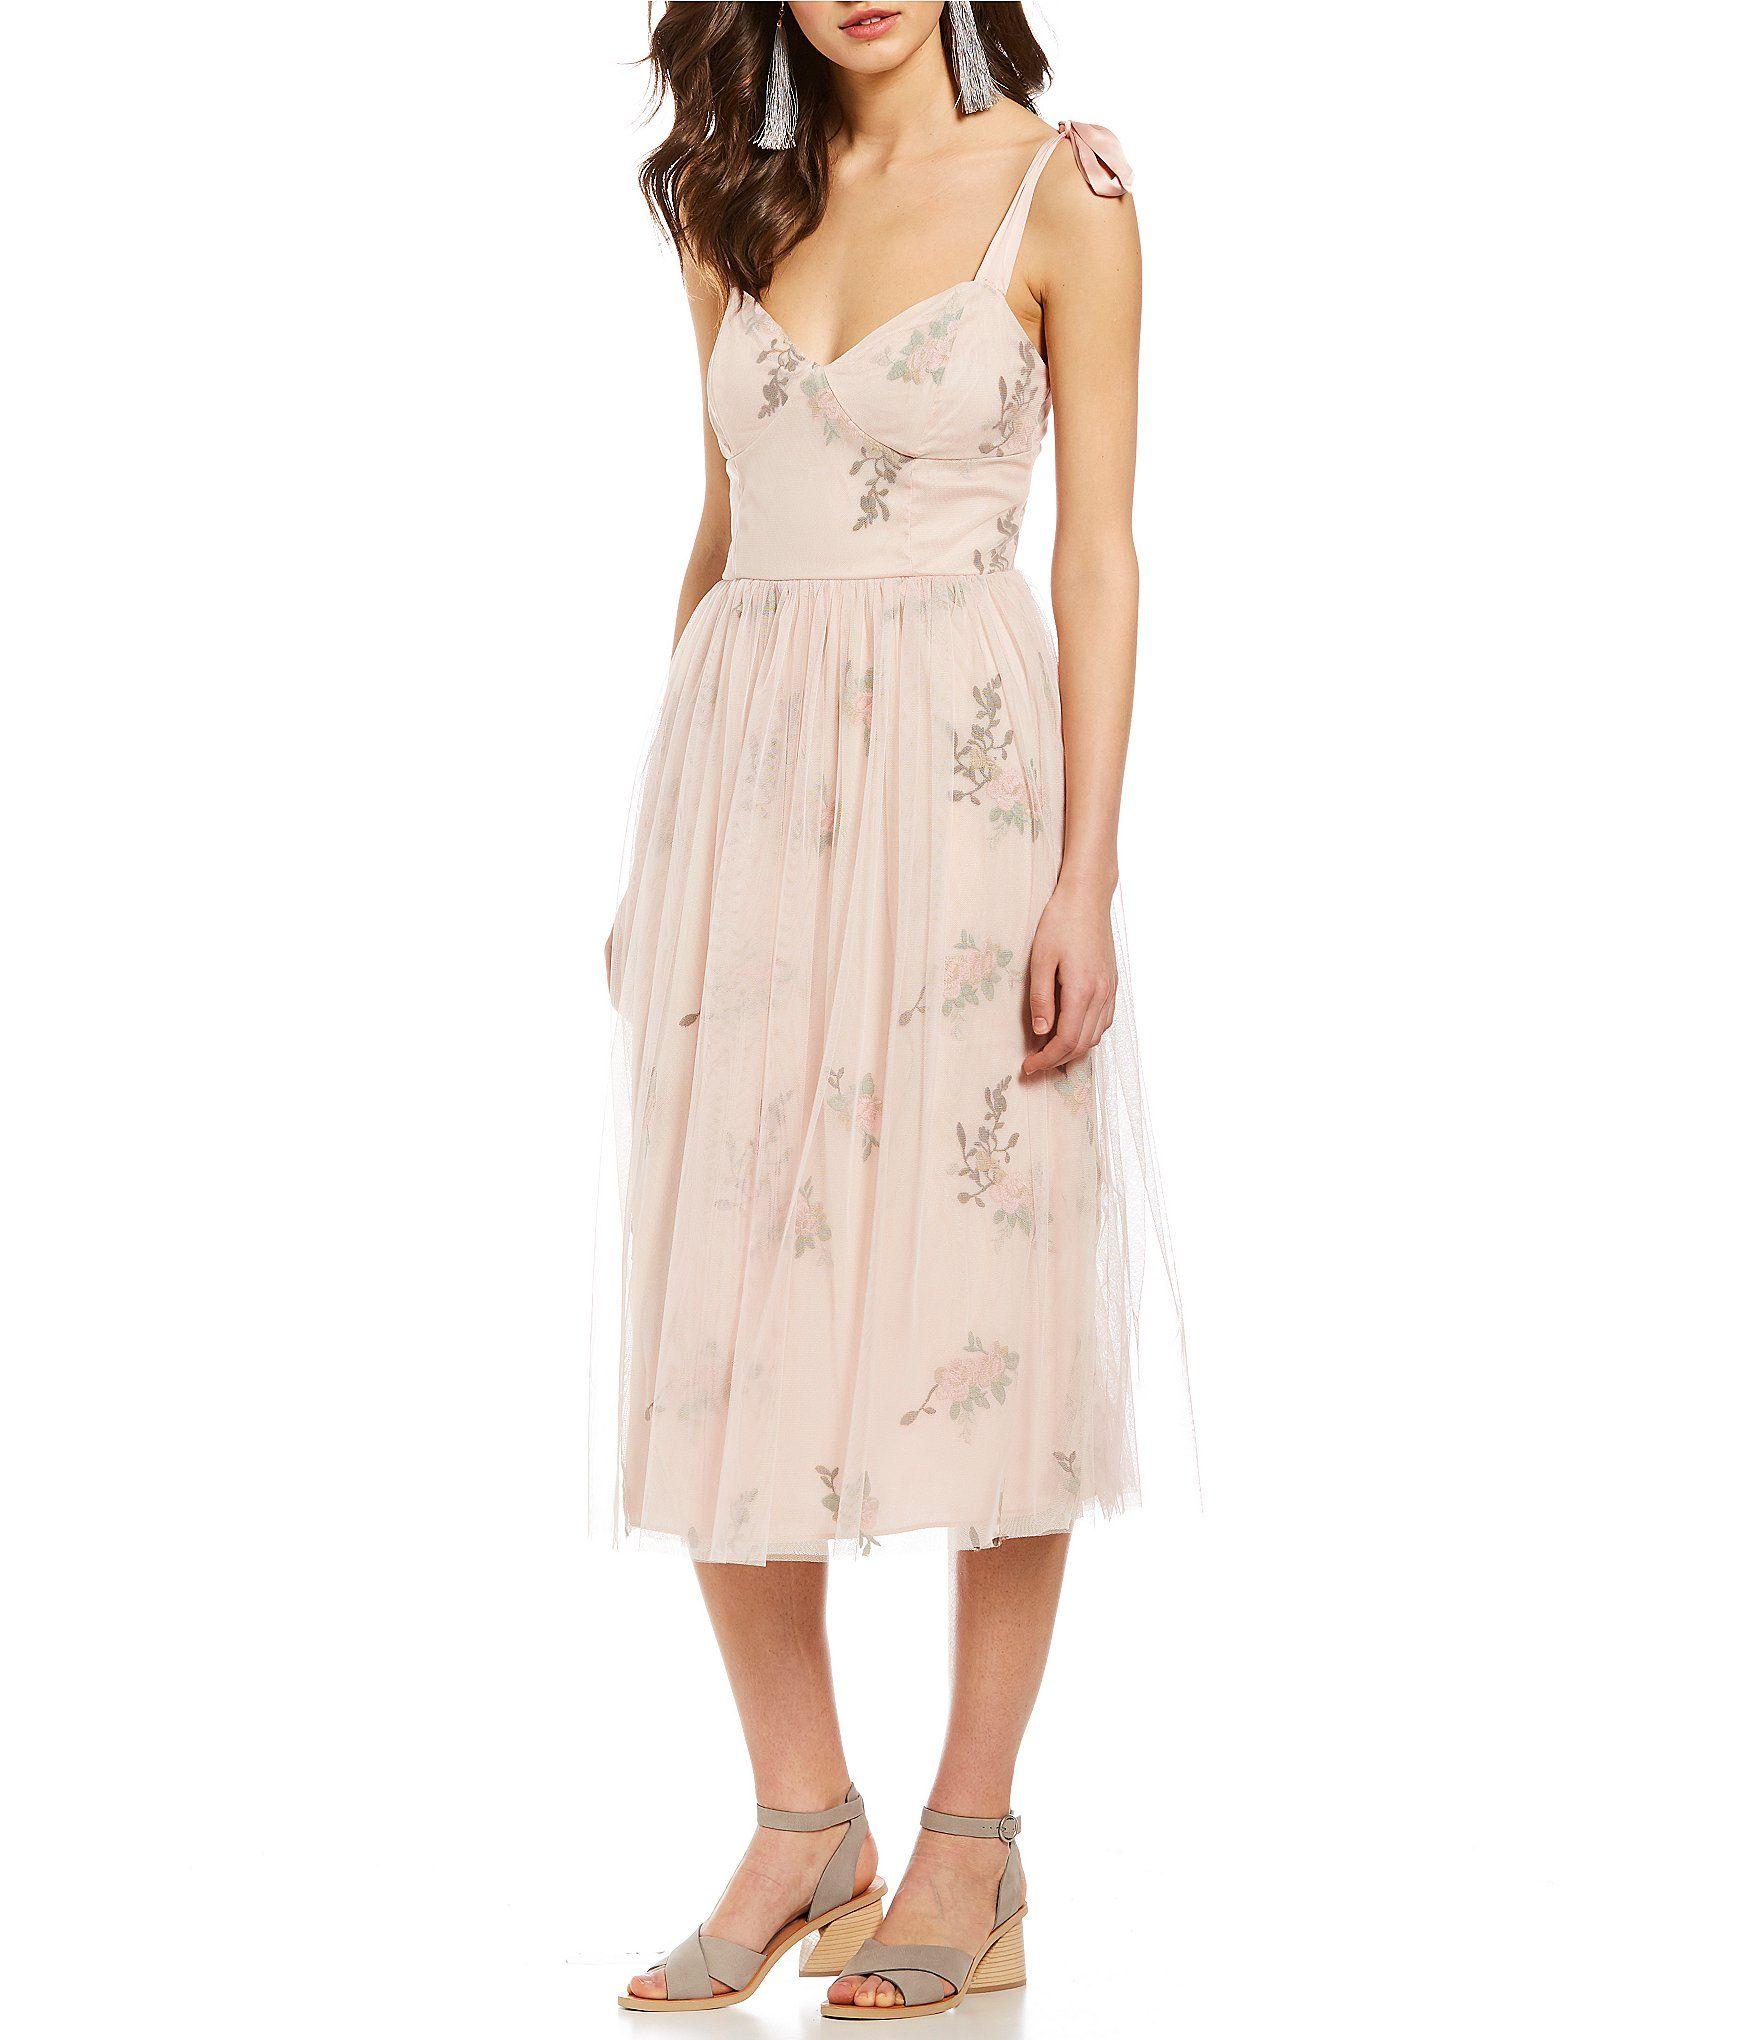 Shop For Chelsea Violet Floral Embroidered Tie Strap Sweetheart Midi Dress At Dillards Com Visit Dil Spring Dresses Casual Floral Bridesmaid Dresses Dresses [ 2040 x 1760 Pixel ]